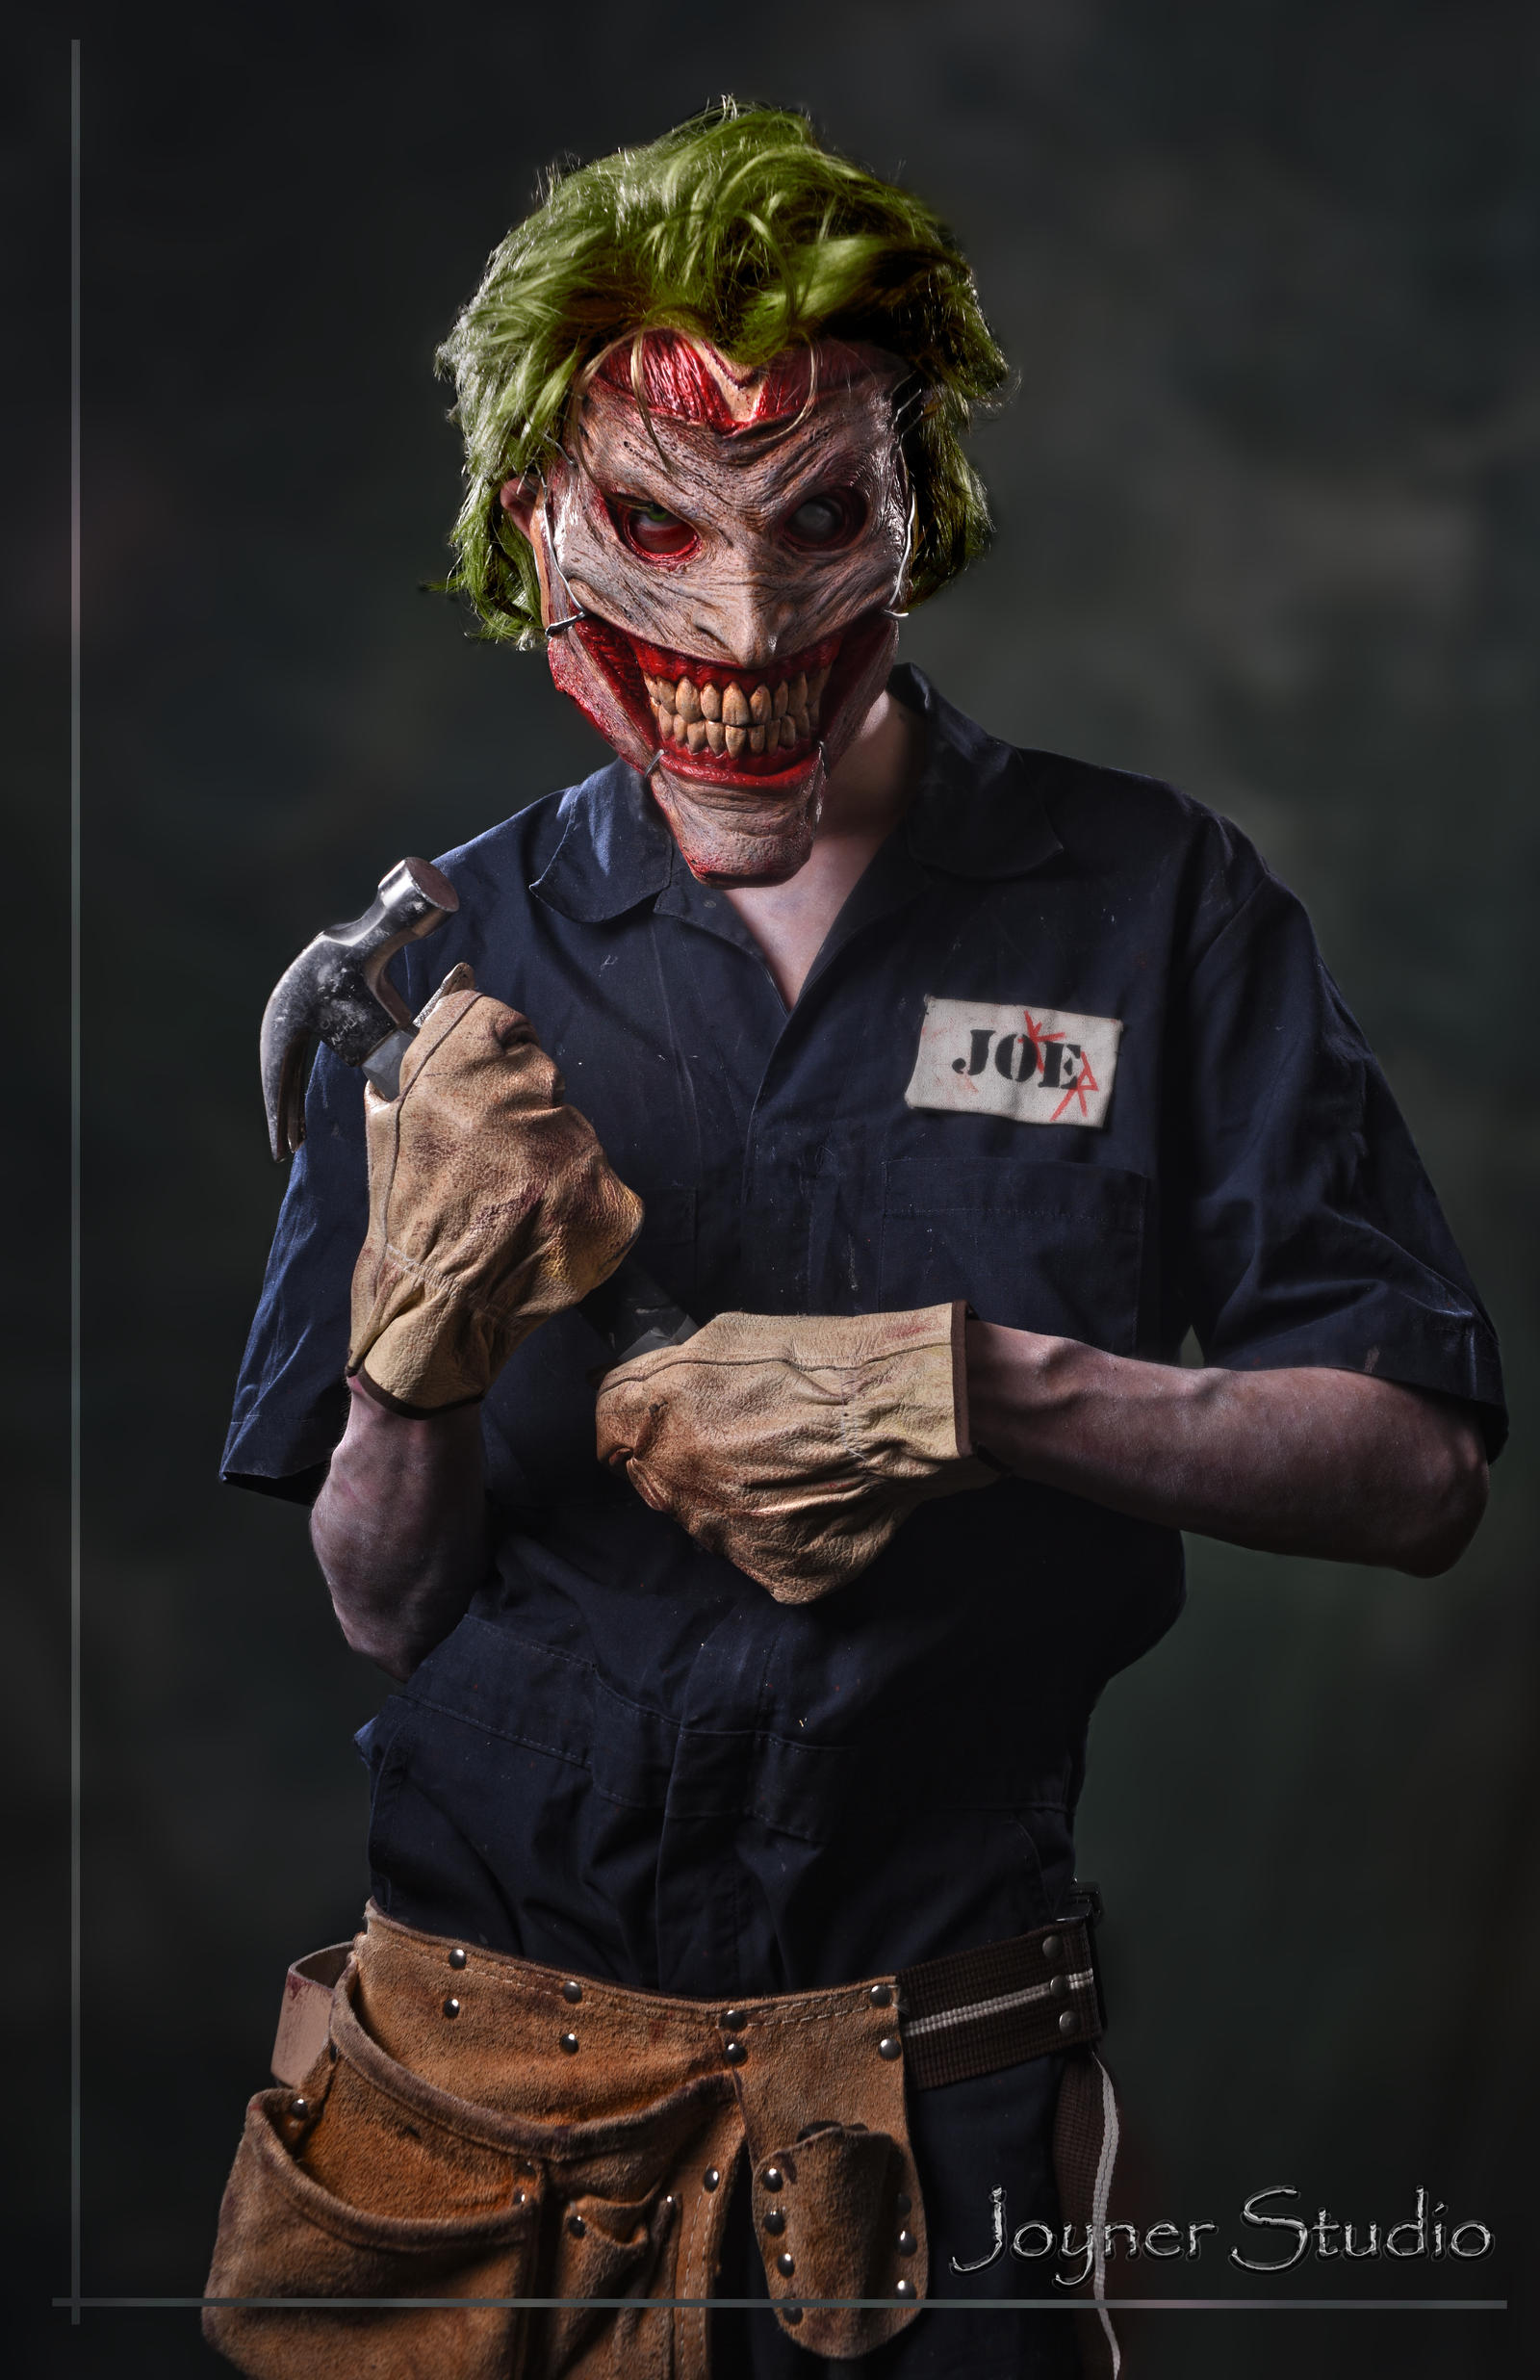 Joyner Studio New 52 Joker Mask Photoshoot